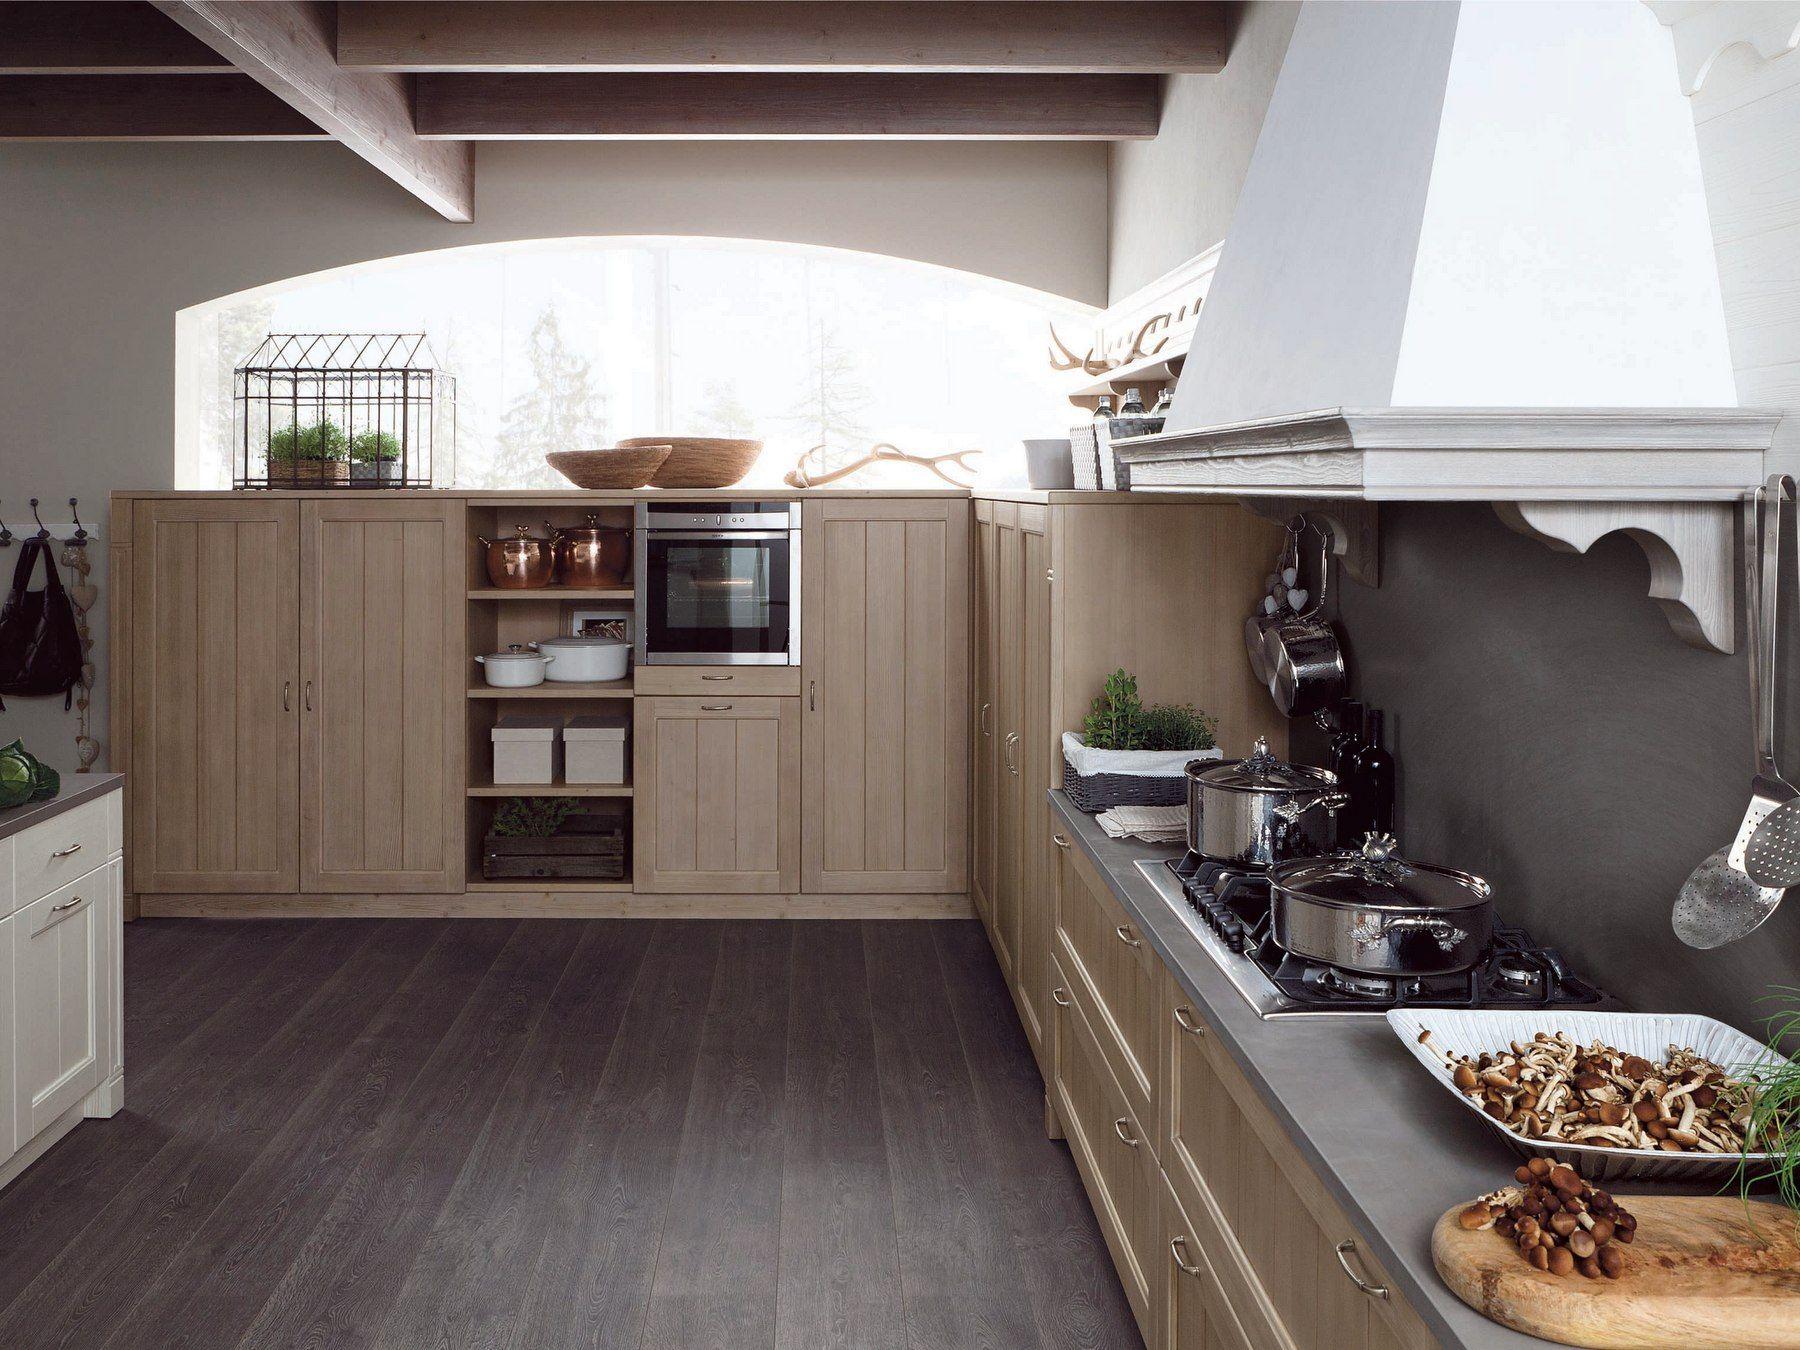 Cucina Stile Rustico Moderno ~ avienix.com for .